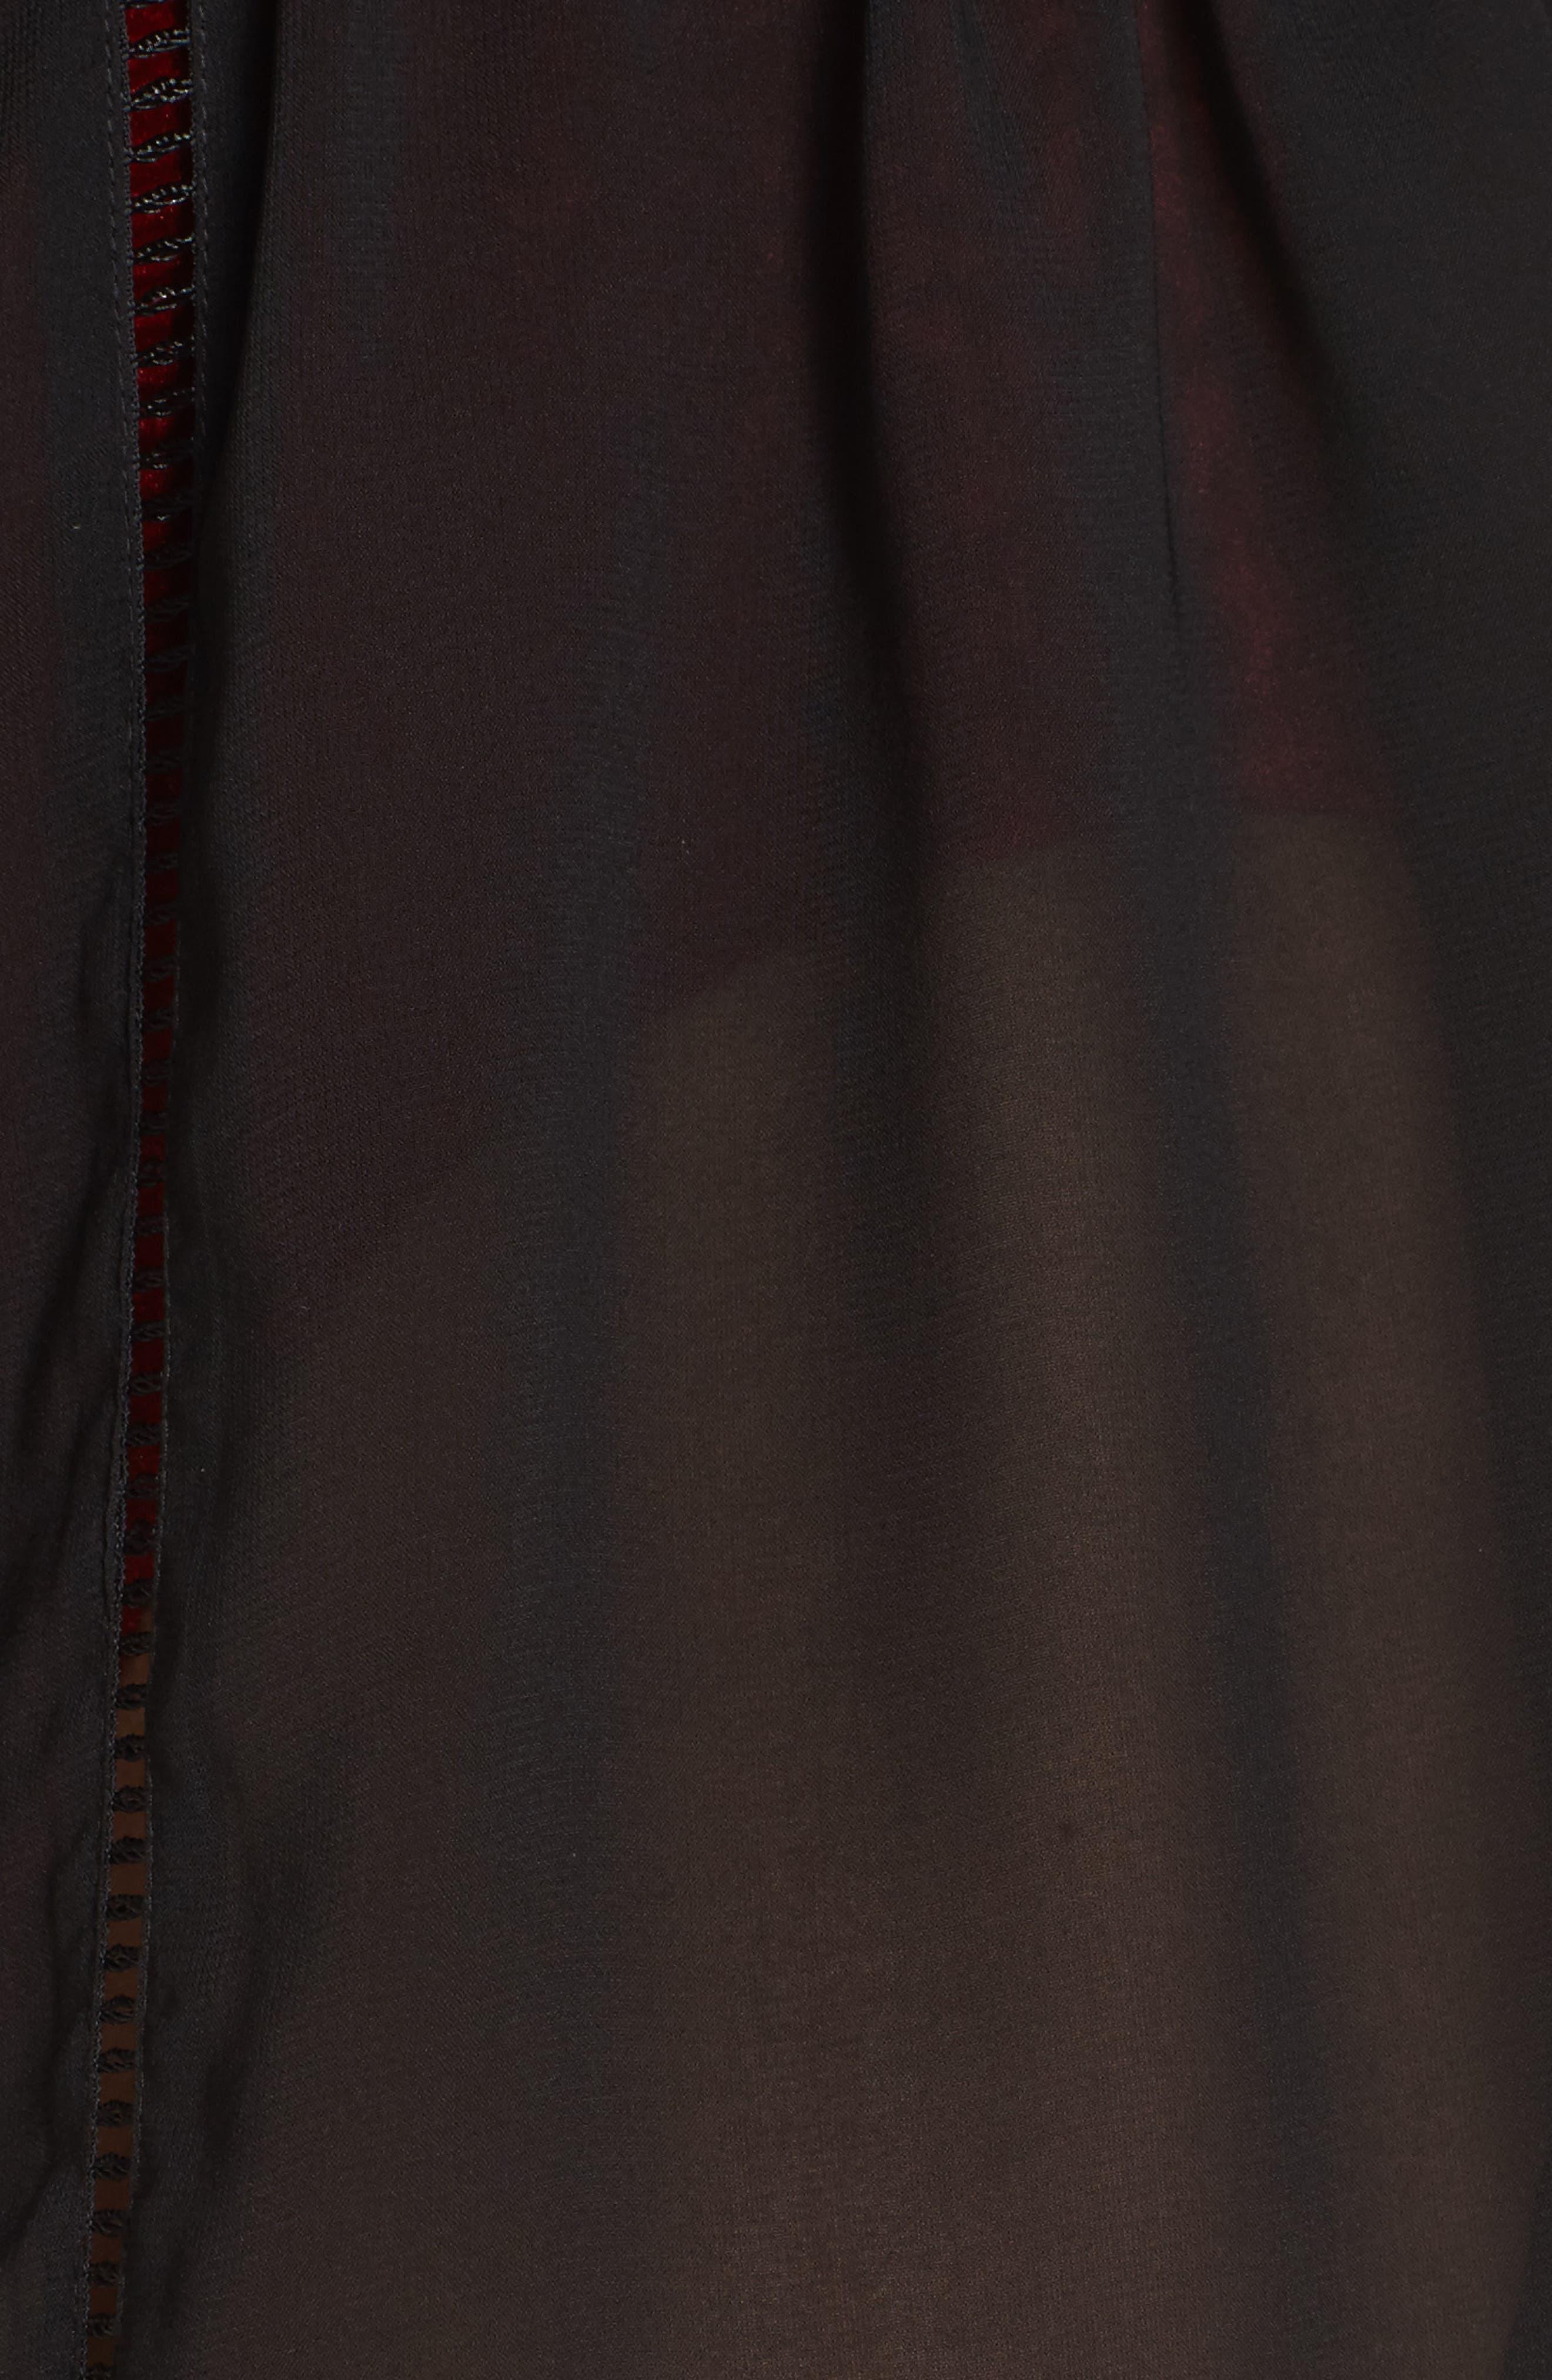 Side Slit Kimono Cover-Up,                             Alternate thumbnail 5, color,                             001